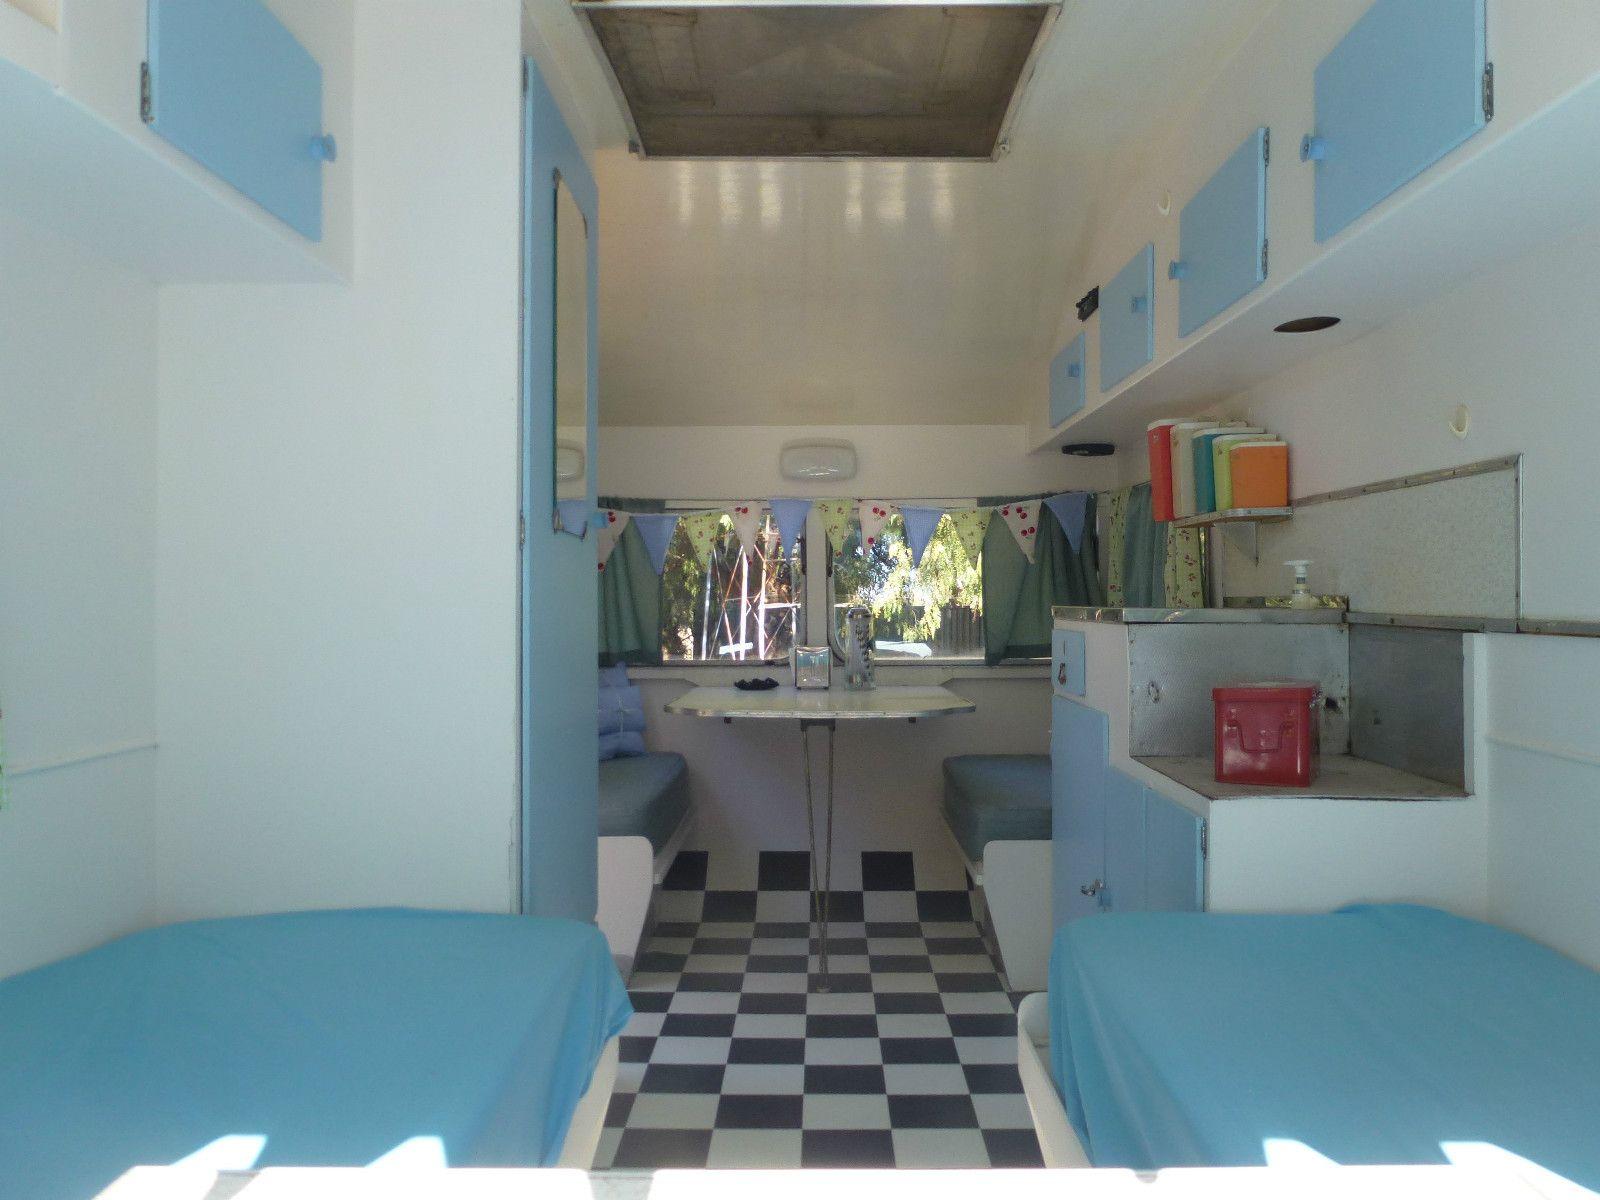 australian vintage caravan interior ideas for the house. Black Bedroom Furniture Sets. Home Design Ideas